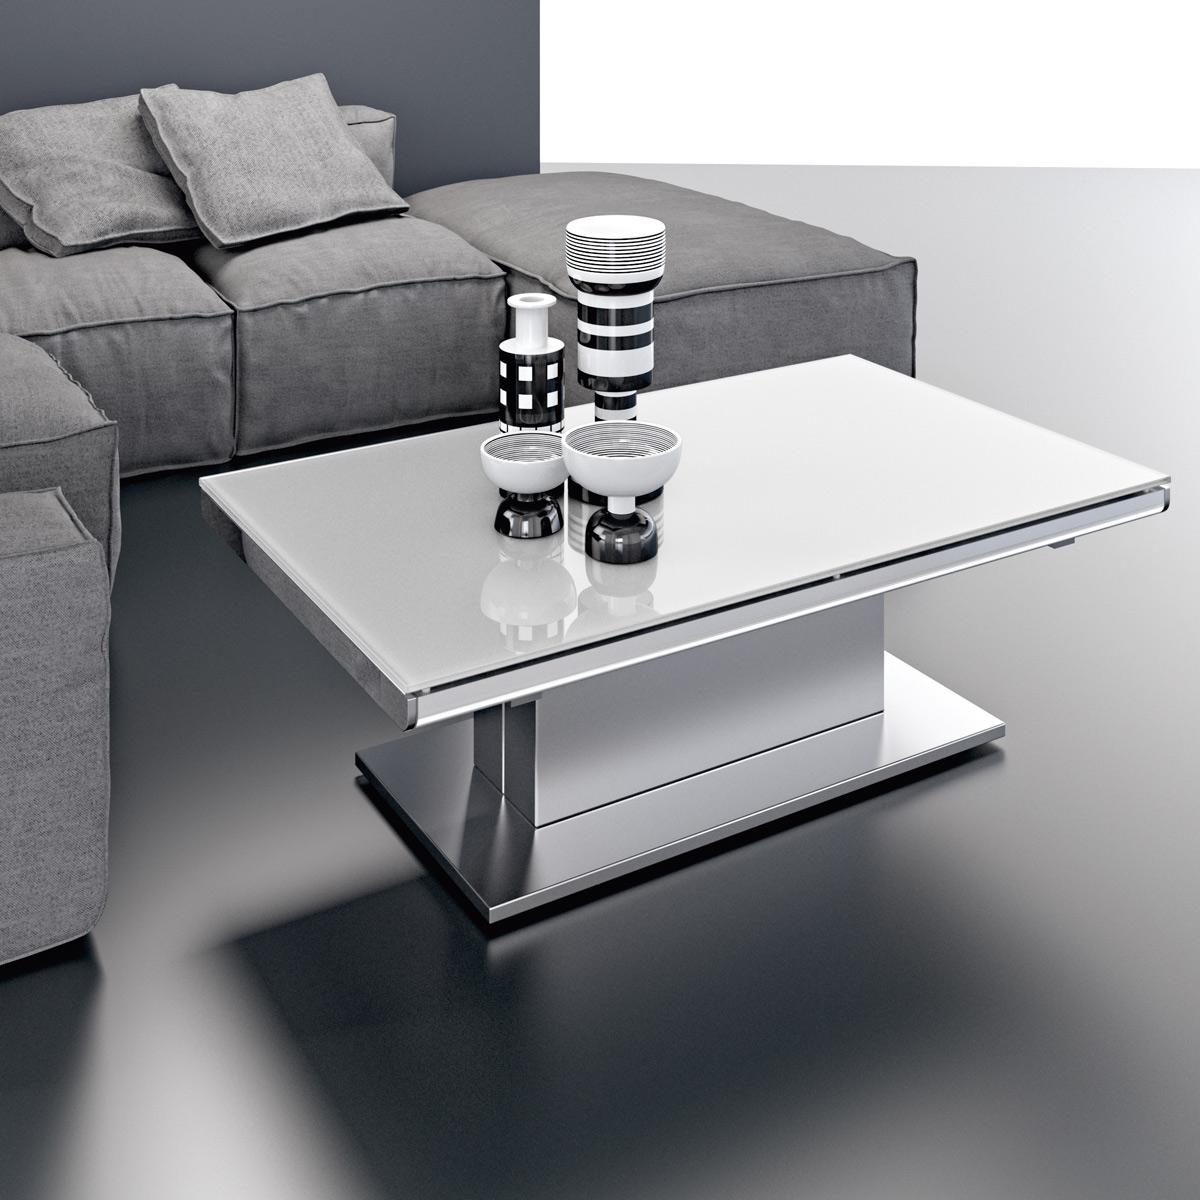 Table basse verre inox design